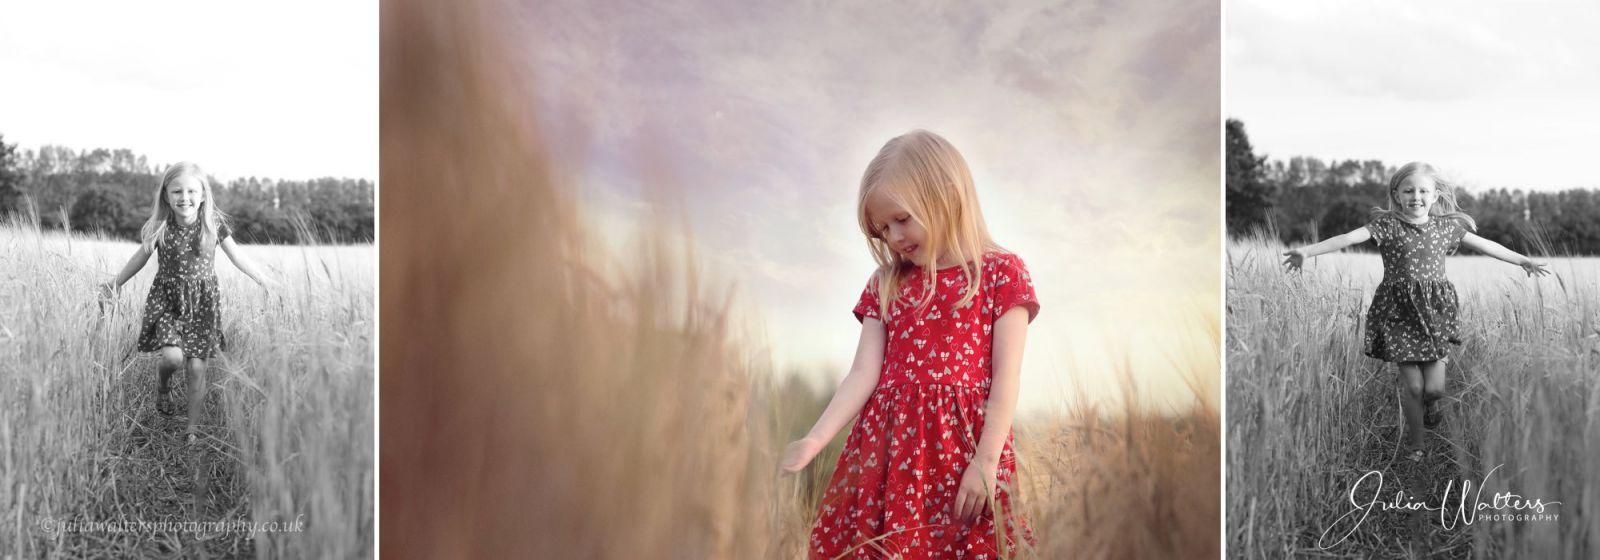 summer Portrait photography